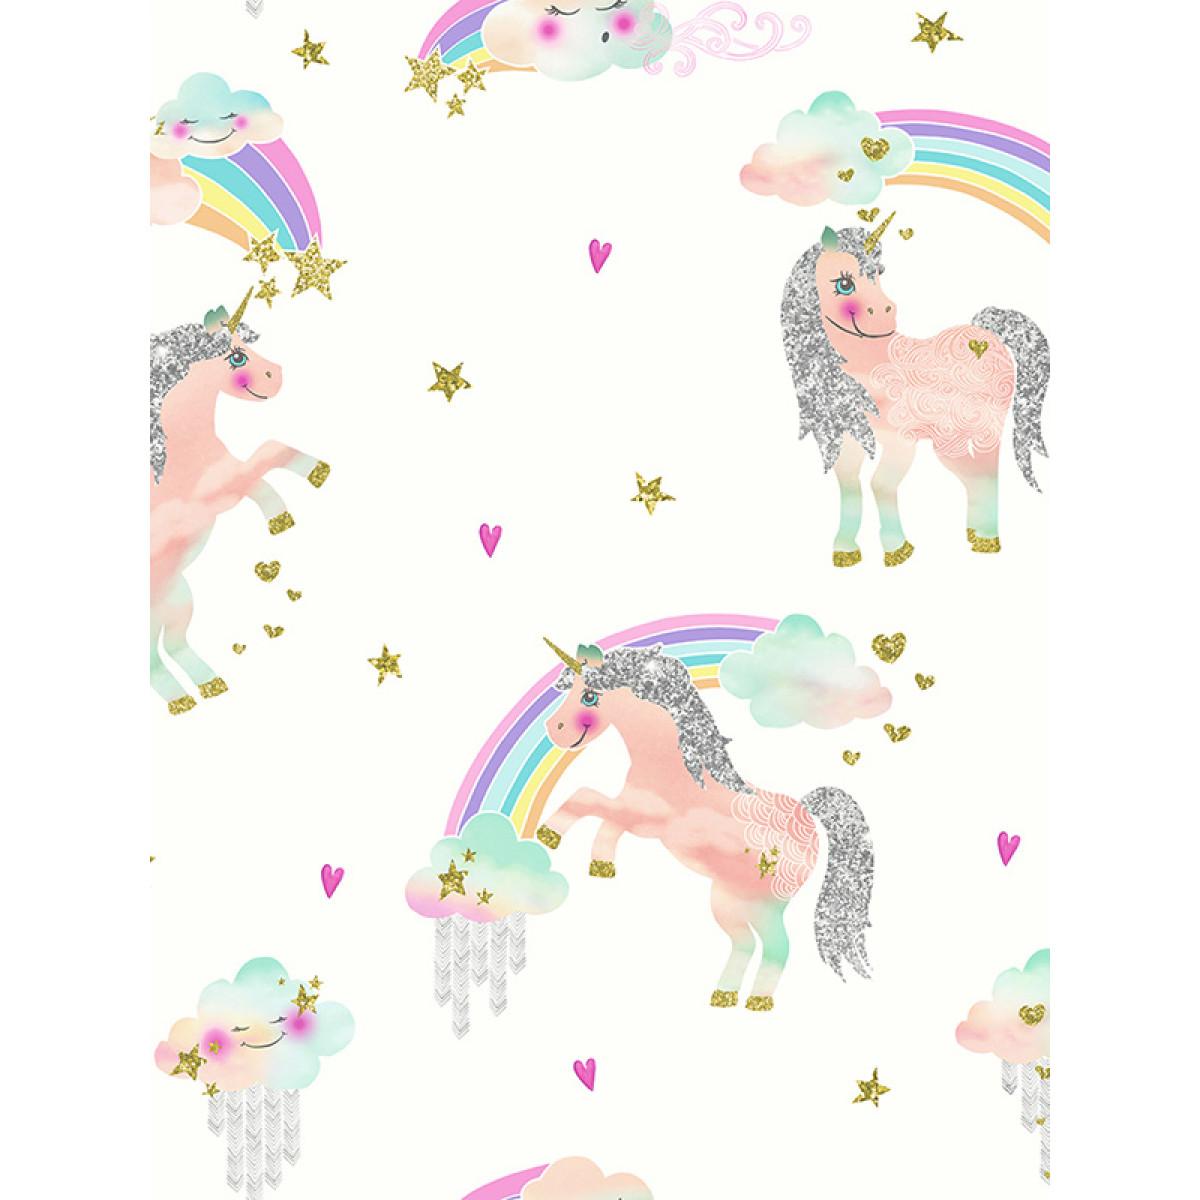 Spiderman Bedroom Decor Rainbow Unicorn Glitter Wallpaper White Arthouse 696109